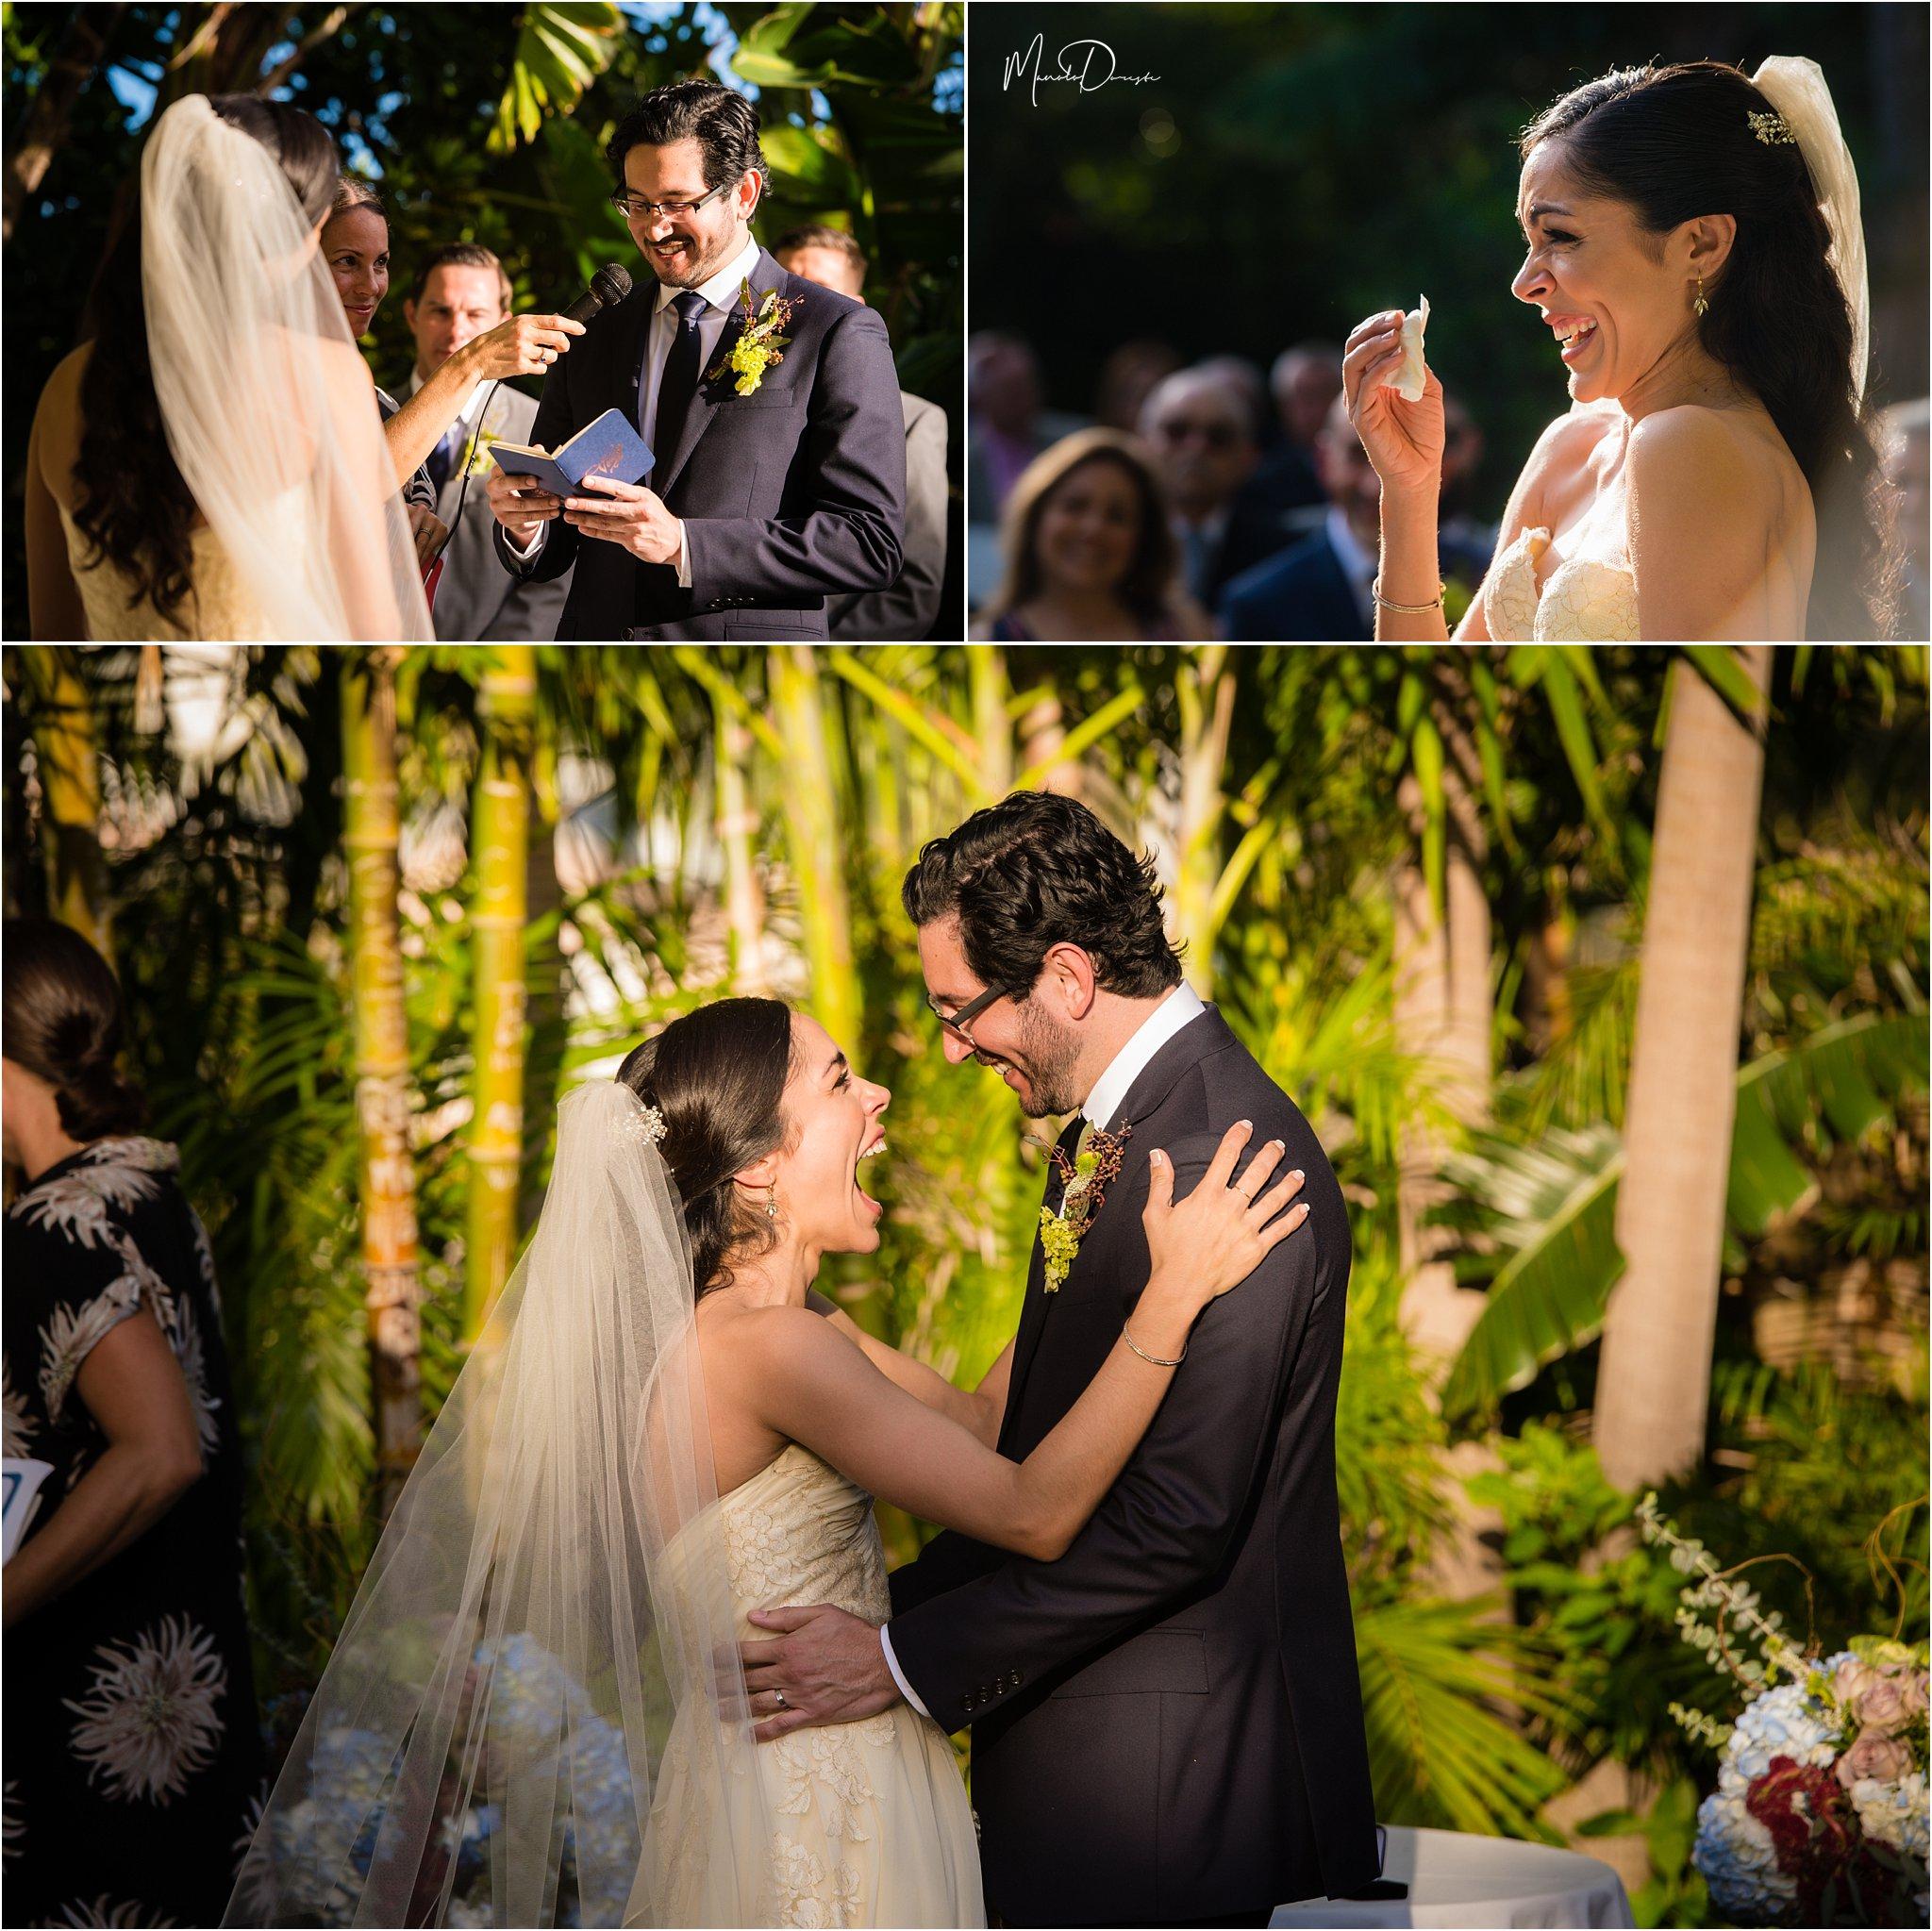 0521_ManoloDoreste_InFocusStudios_Wedding_Family_Photography_Miami_MiamiPhotographer.jpg